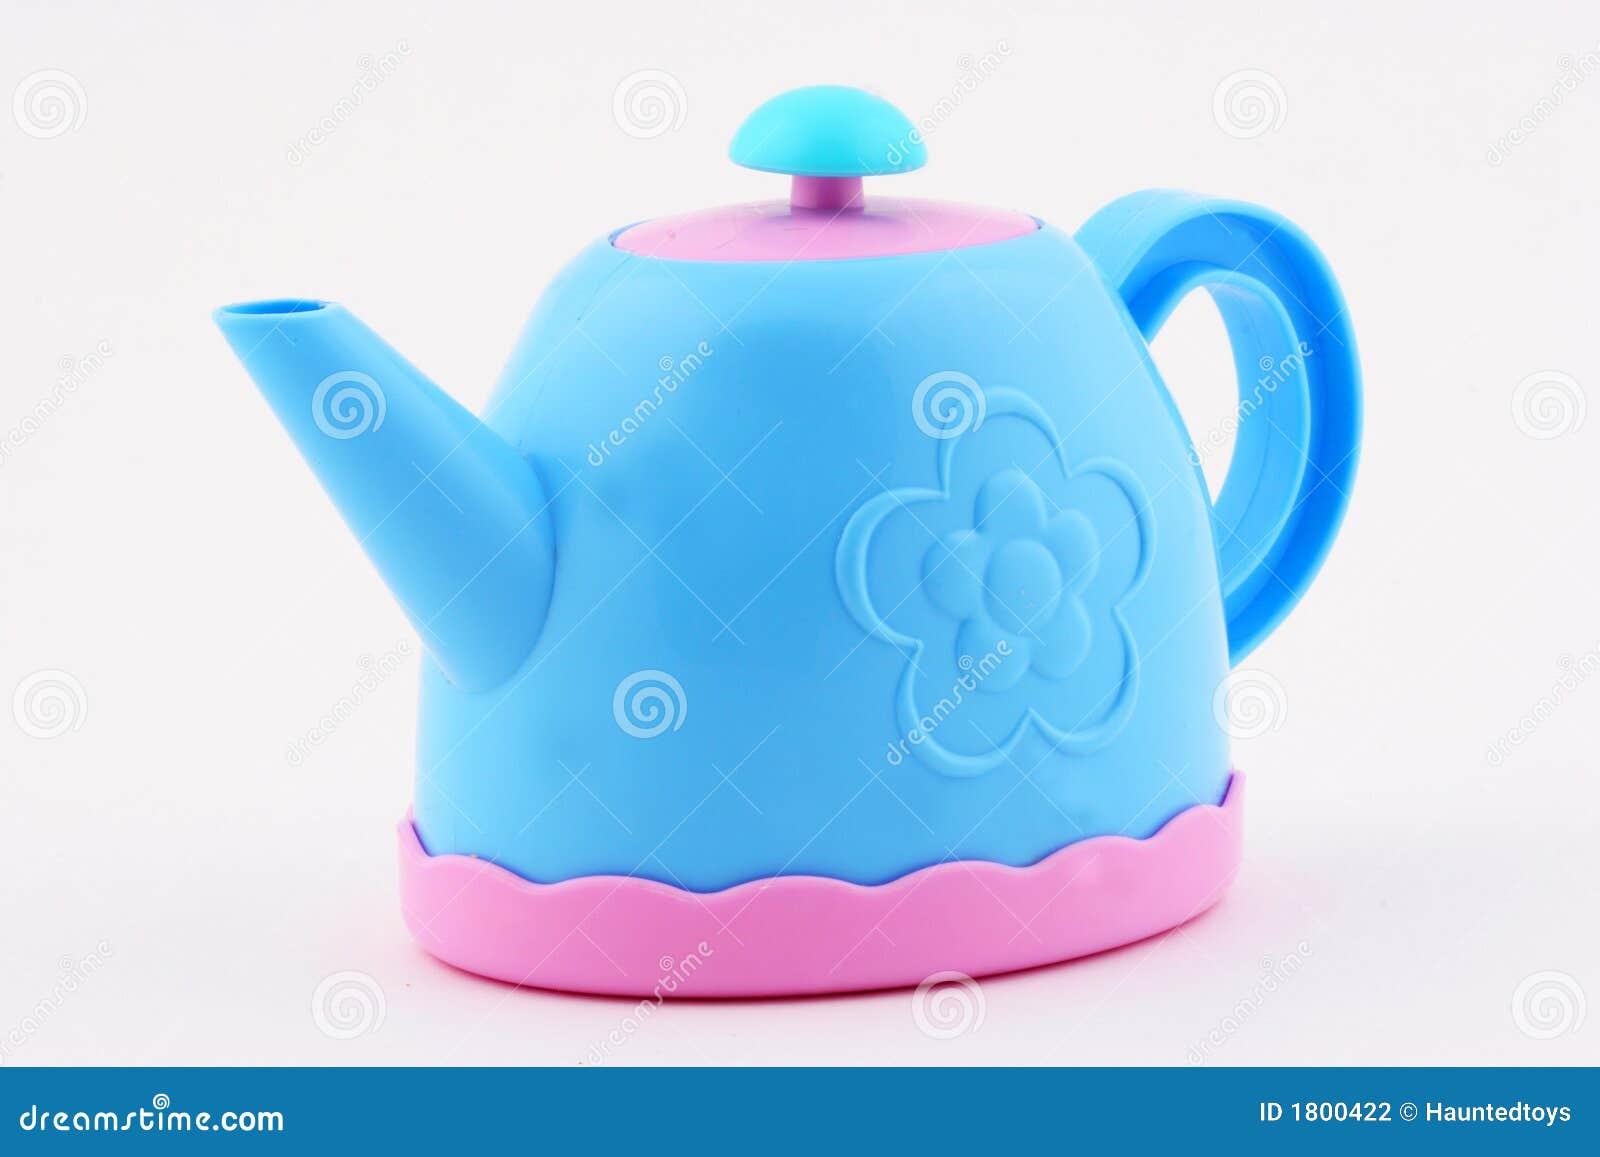 Toy Tea Pot Stock Photography Image 1800422